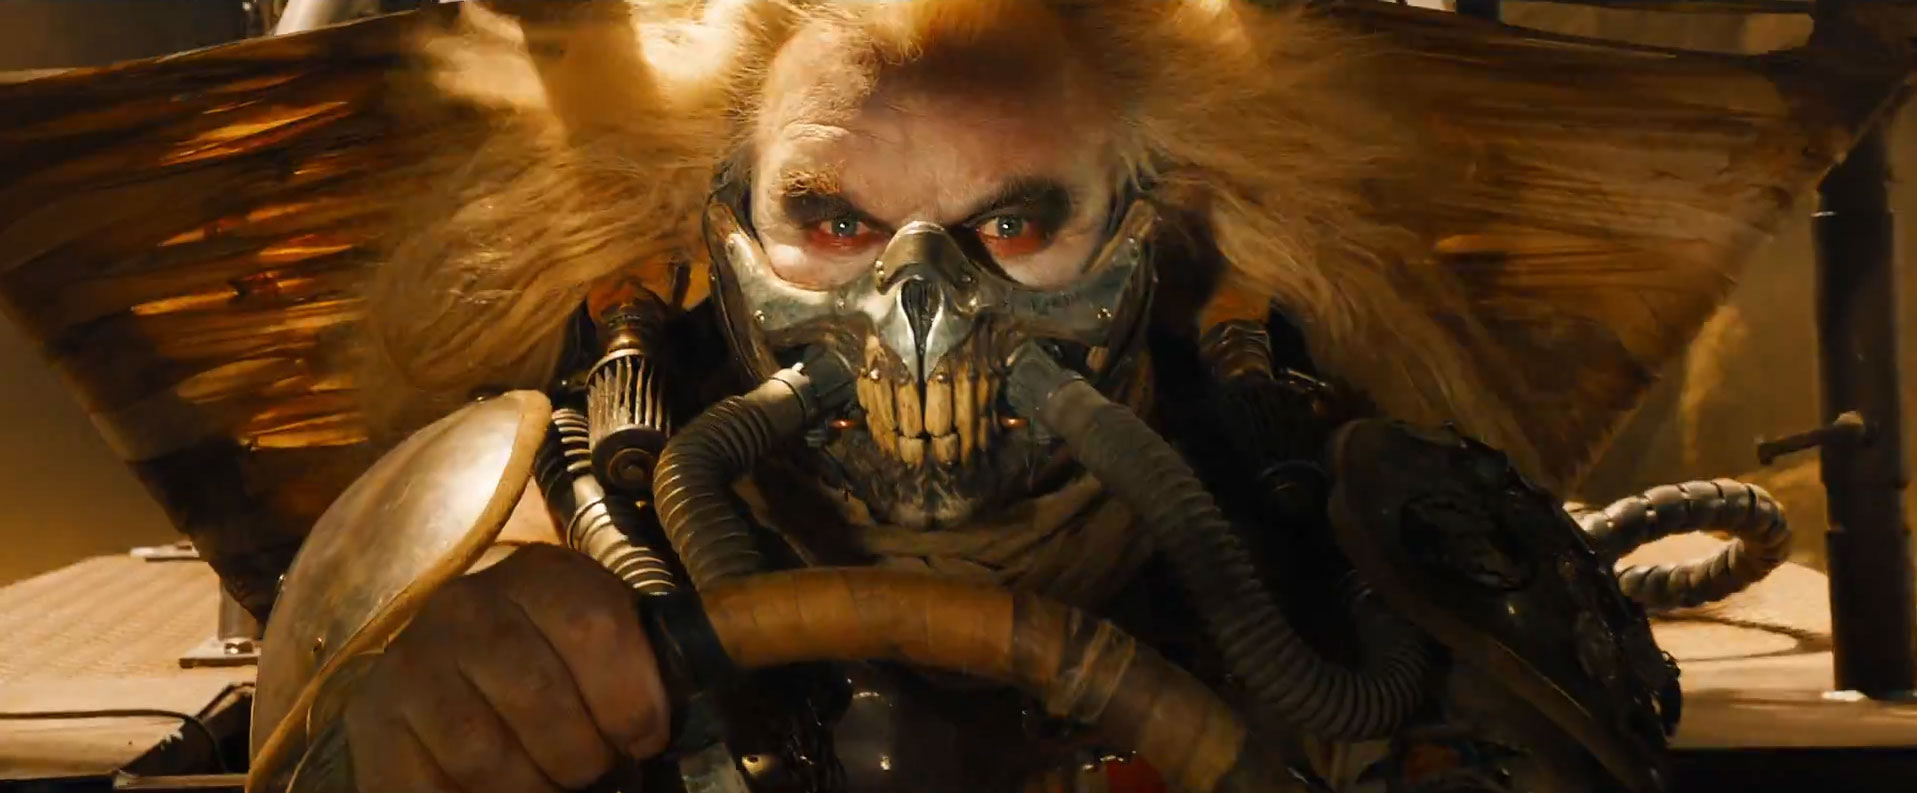 Mad Max Fury Road Review. Hugh Keays-Byrne as the diabolical Immortan Joe.